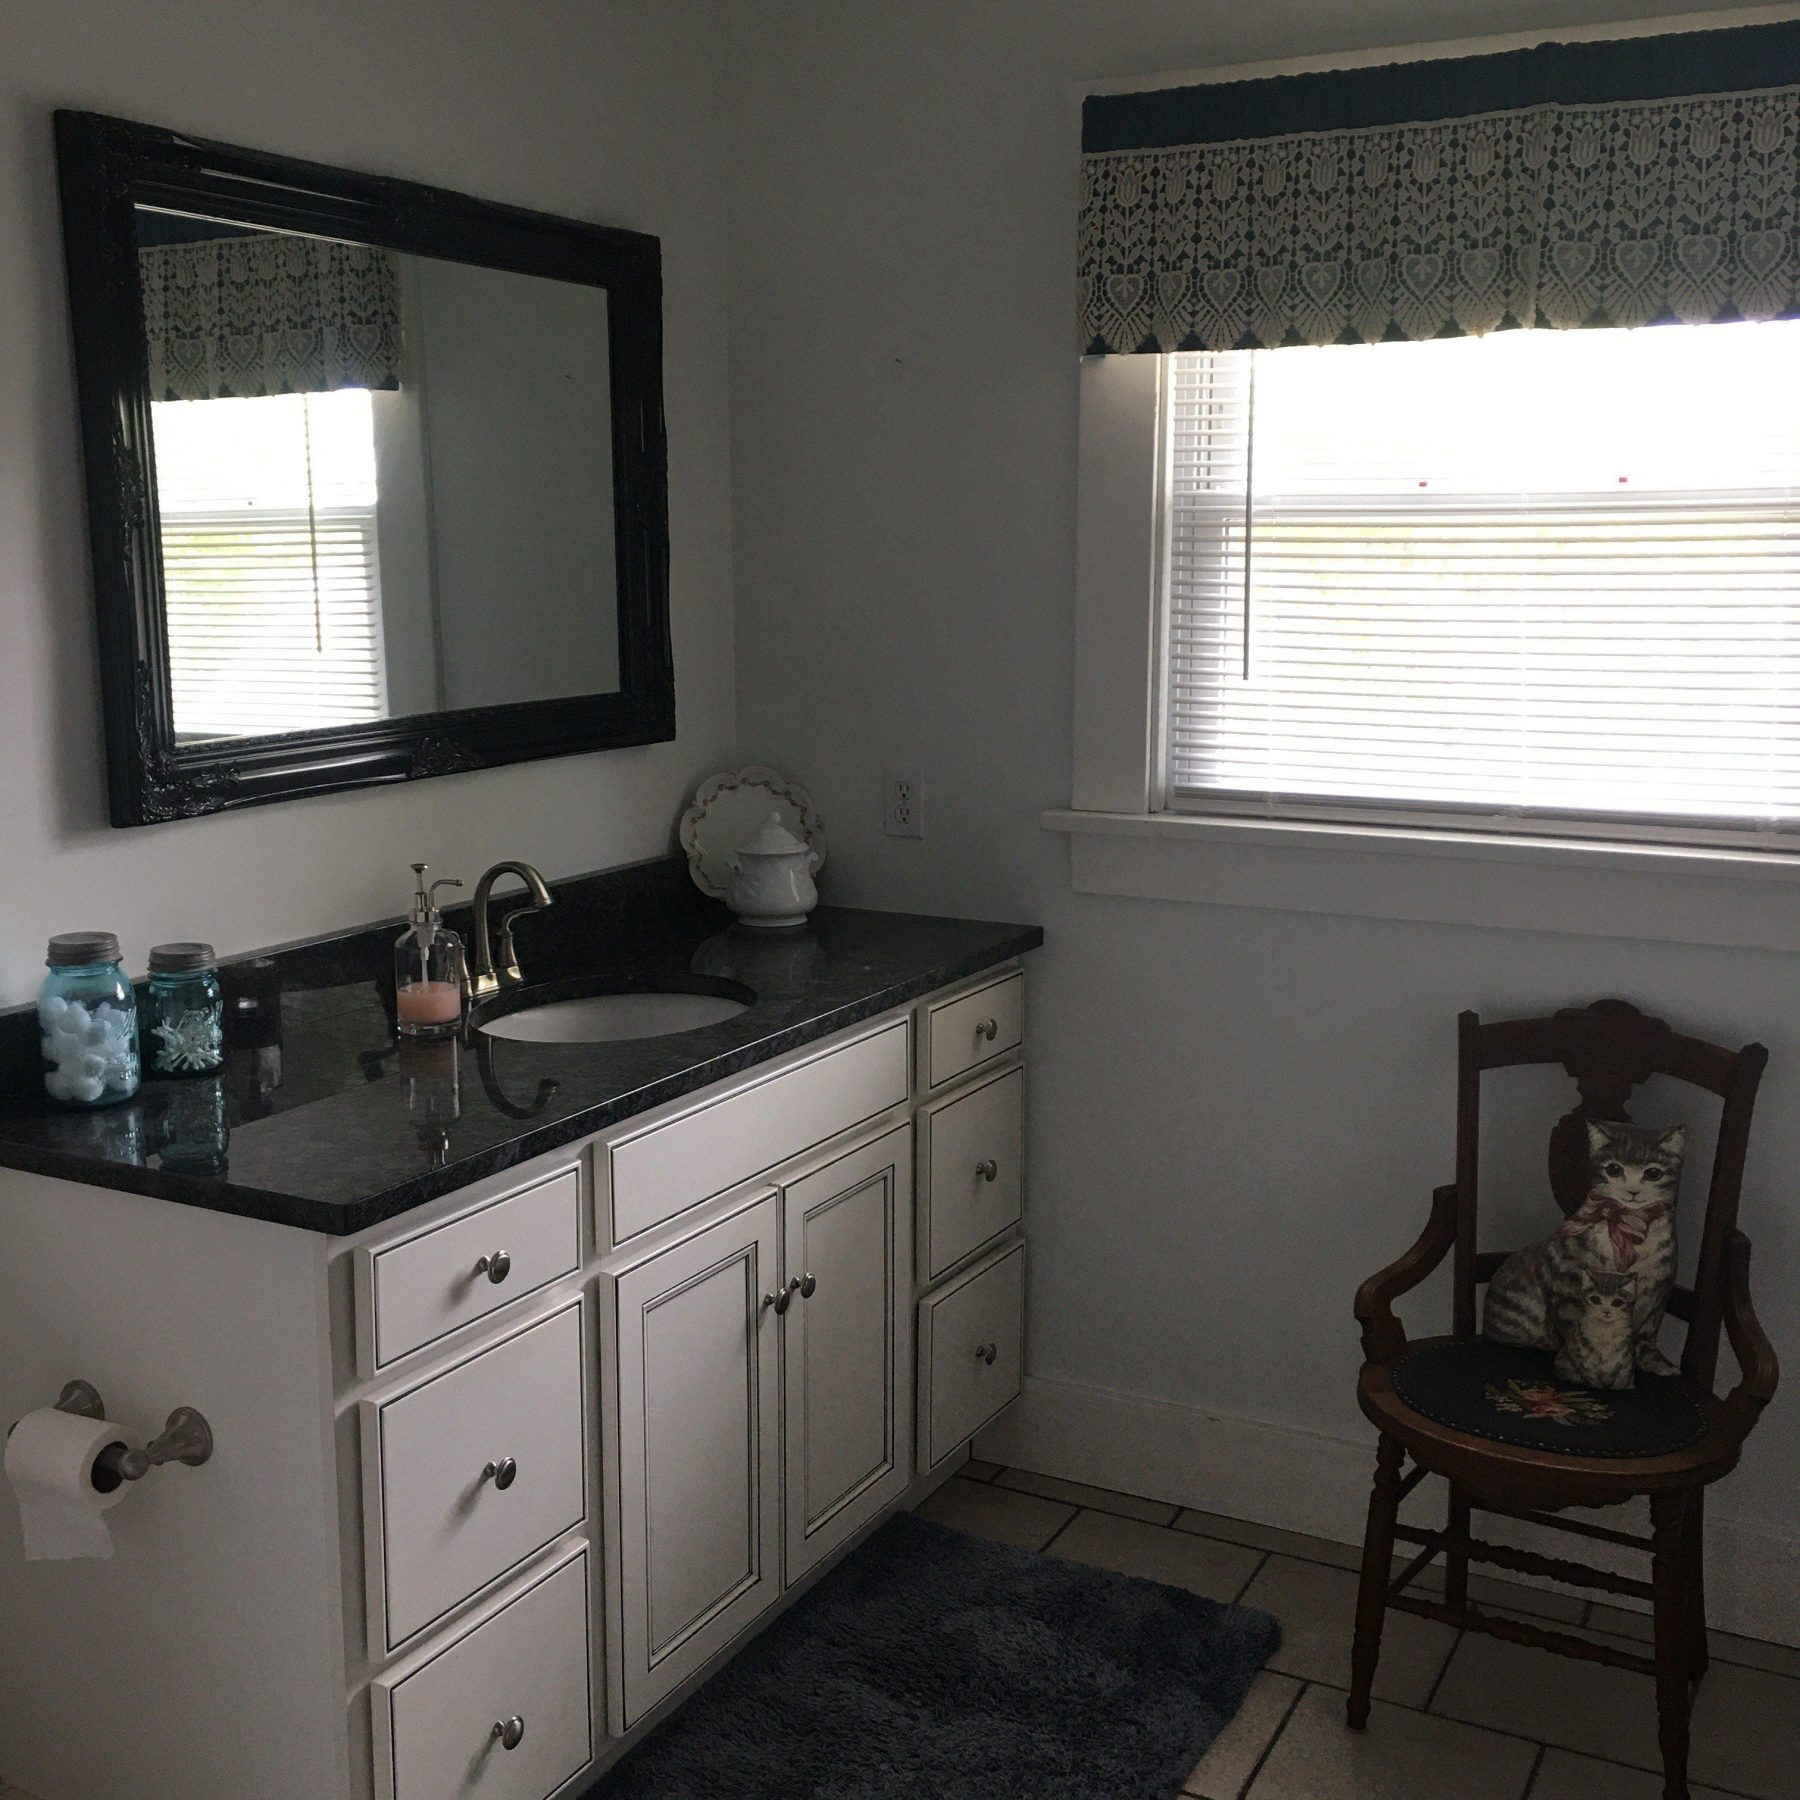 Goodell bathroom